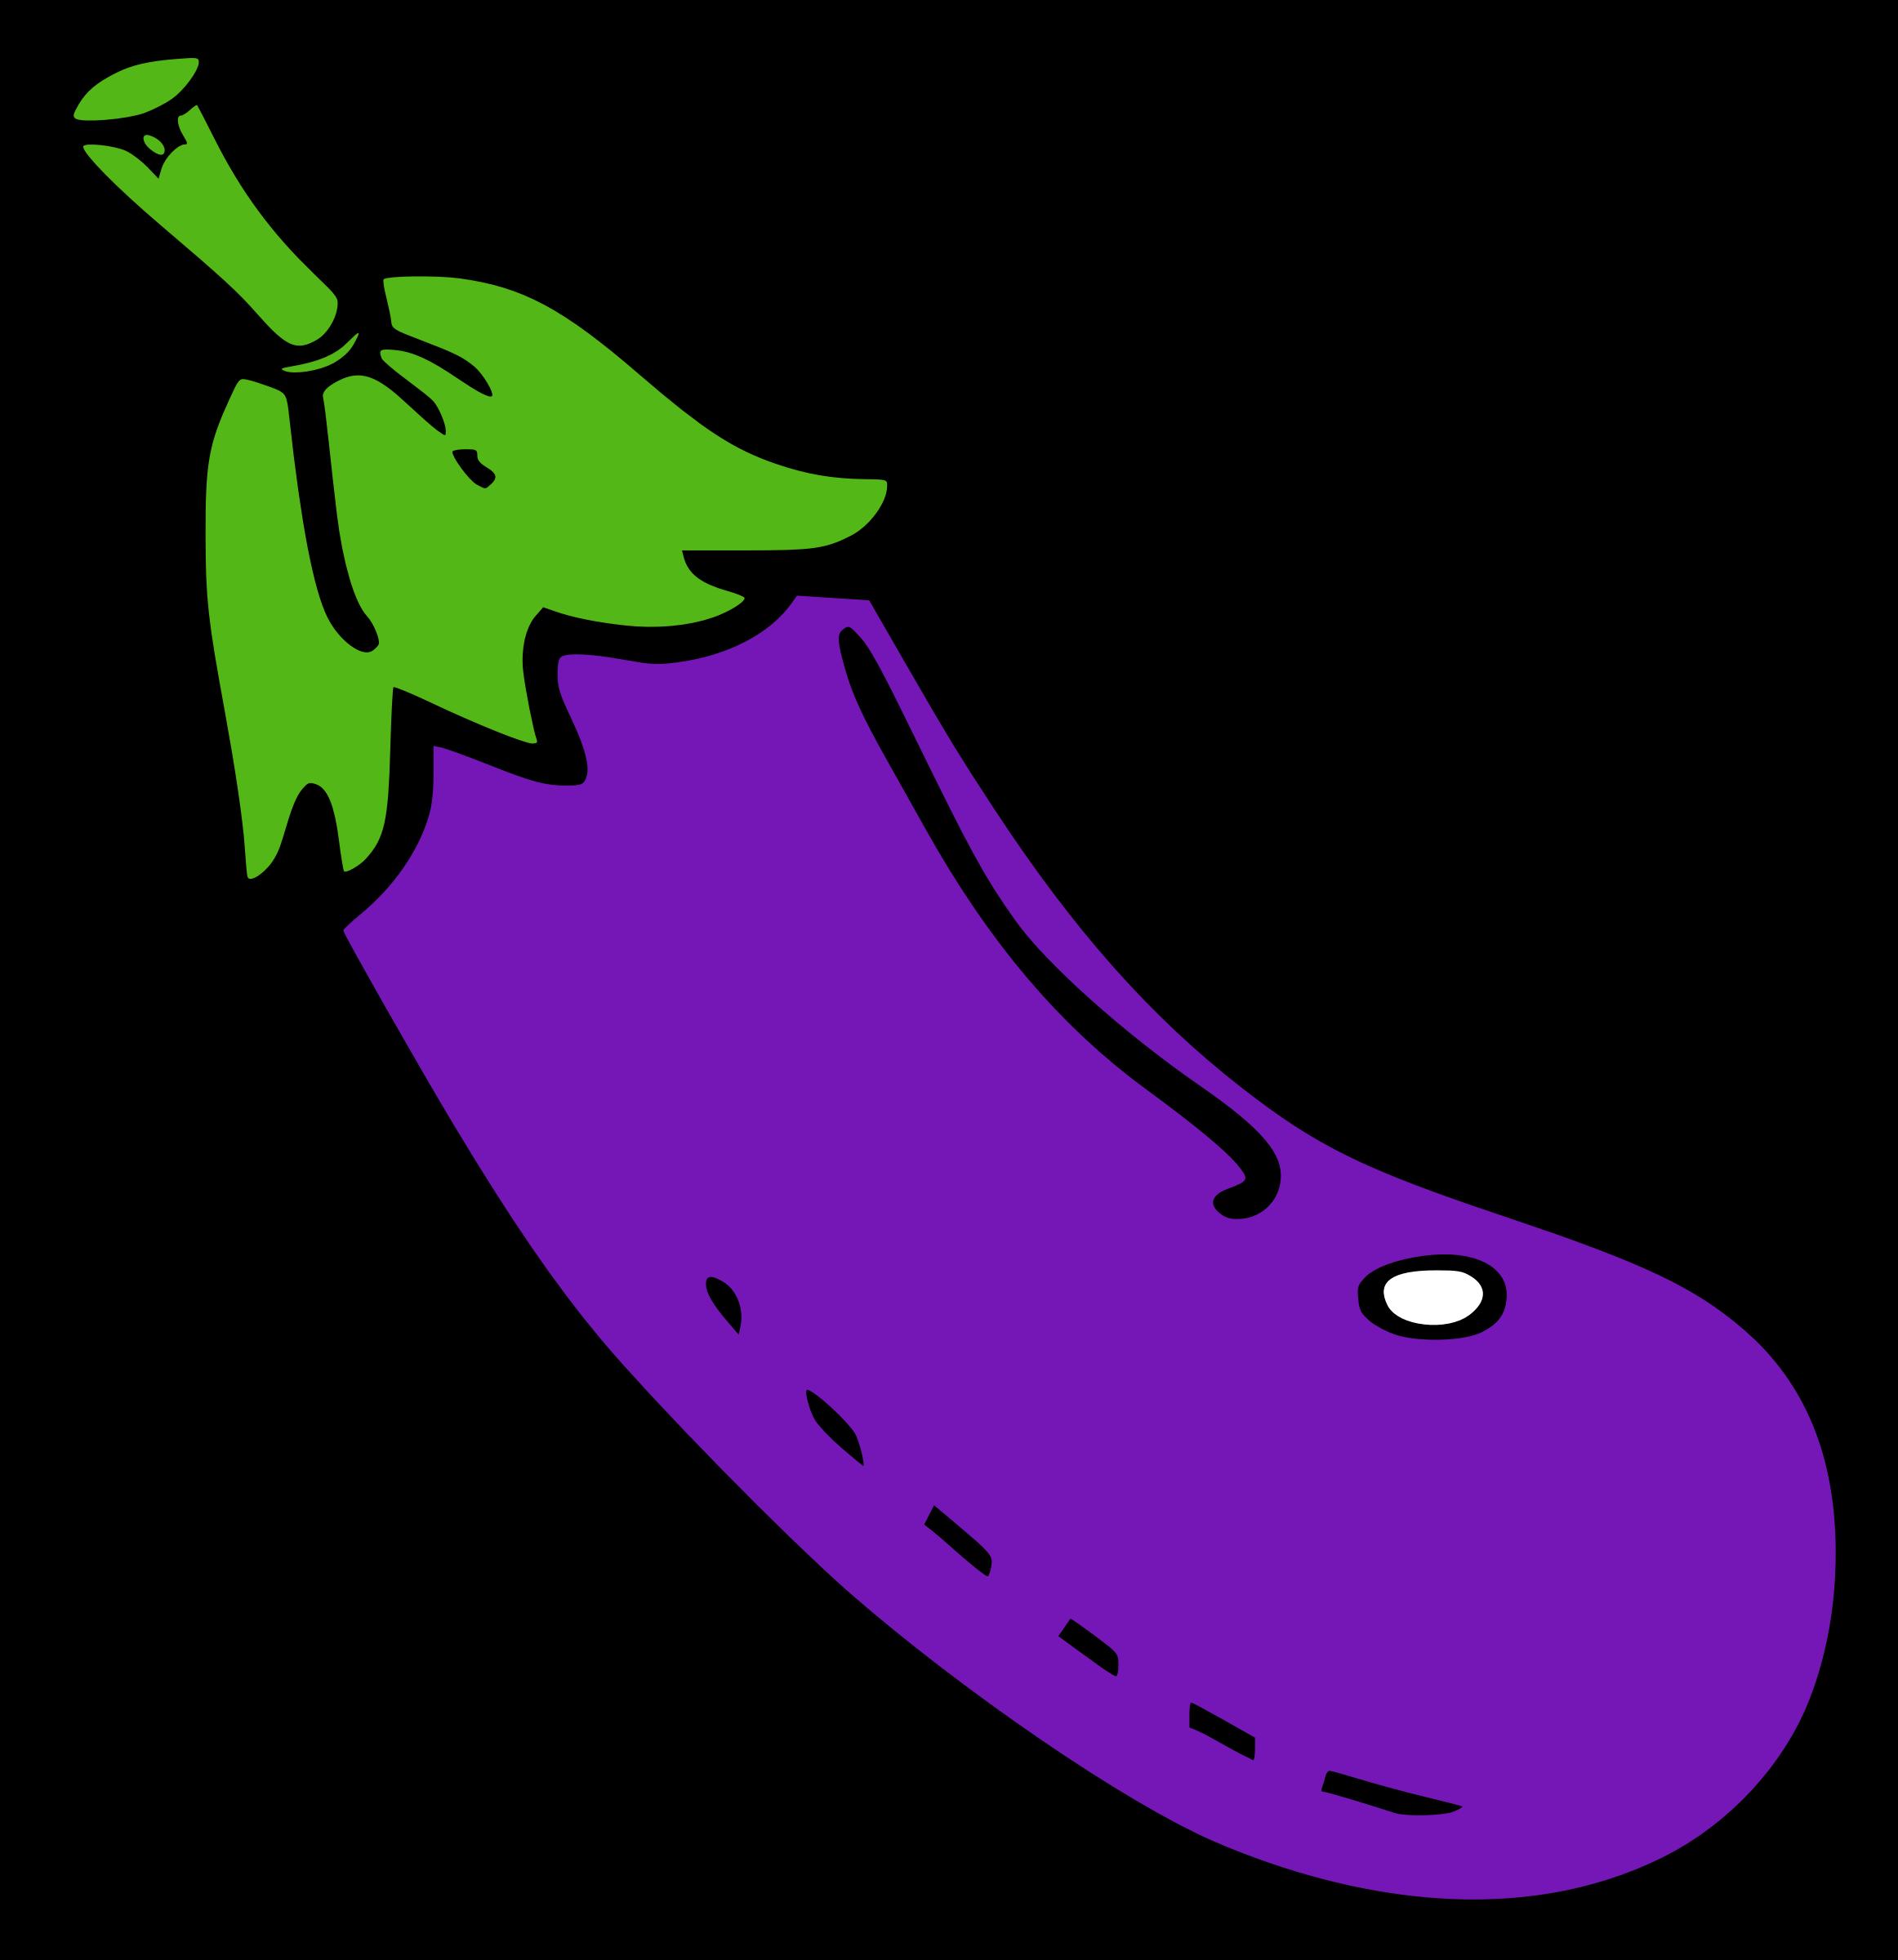 Eggplant big image png. Purple clipart brinjal